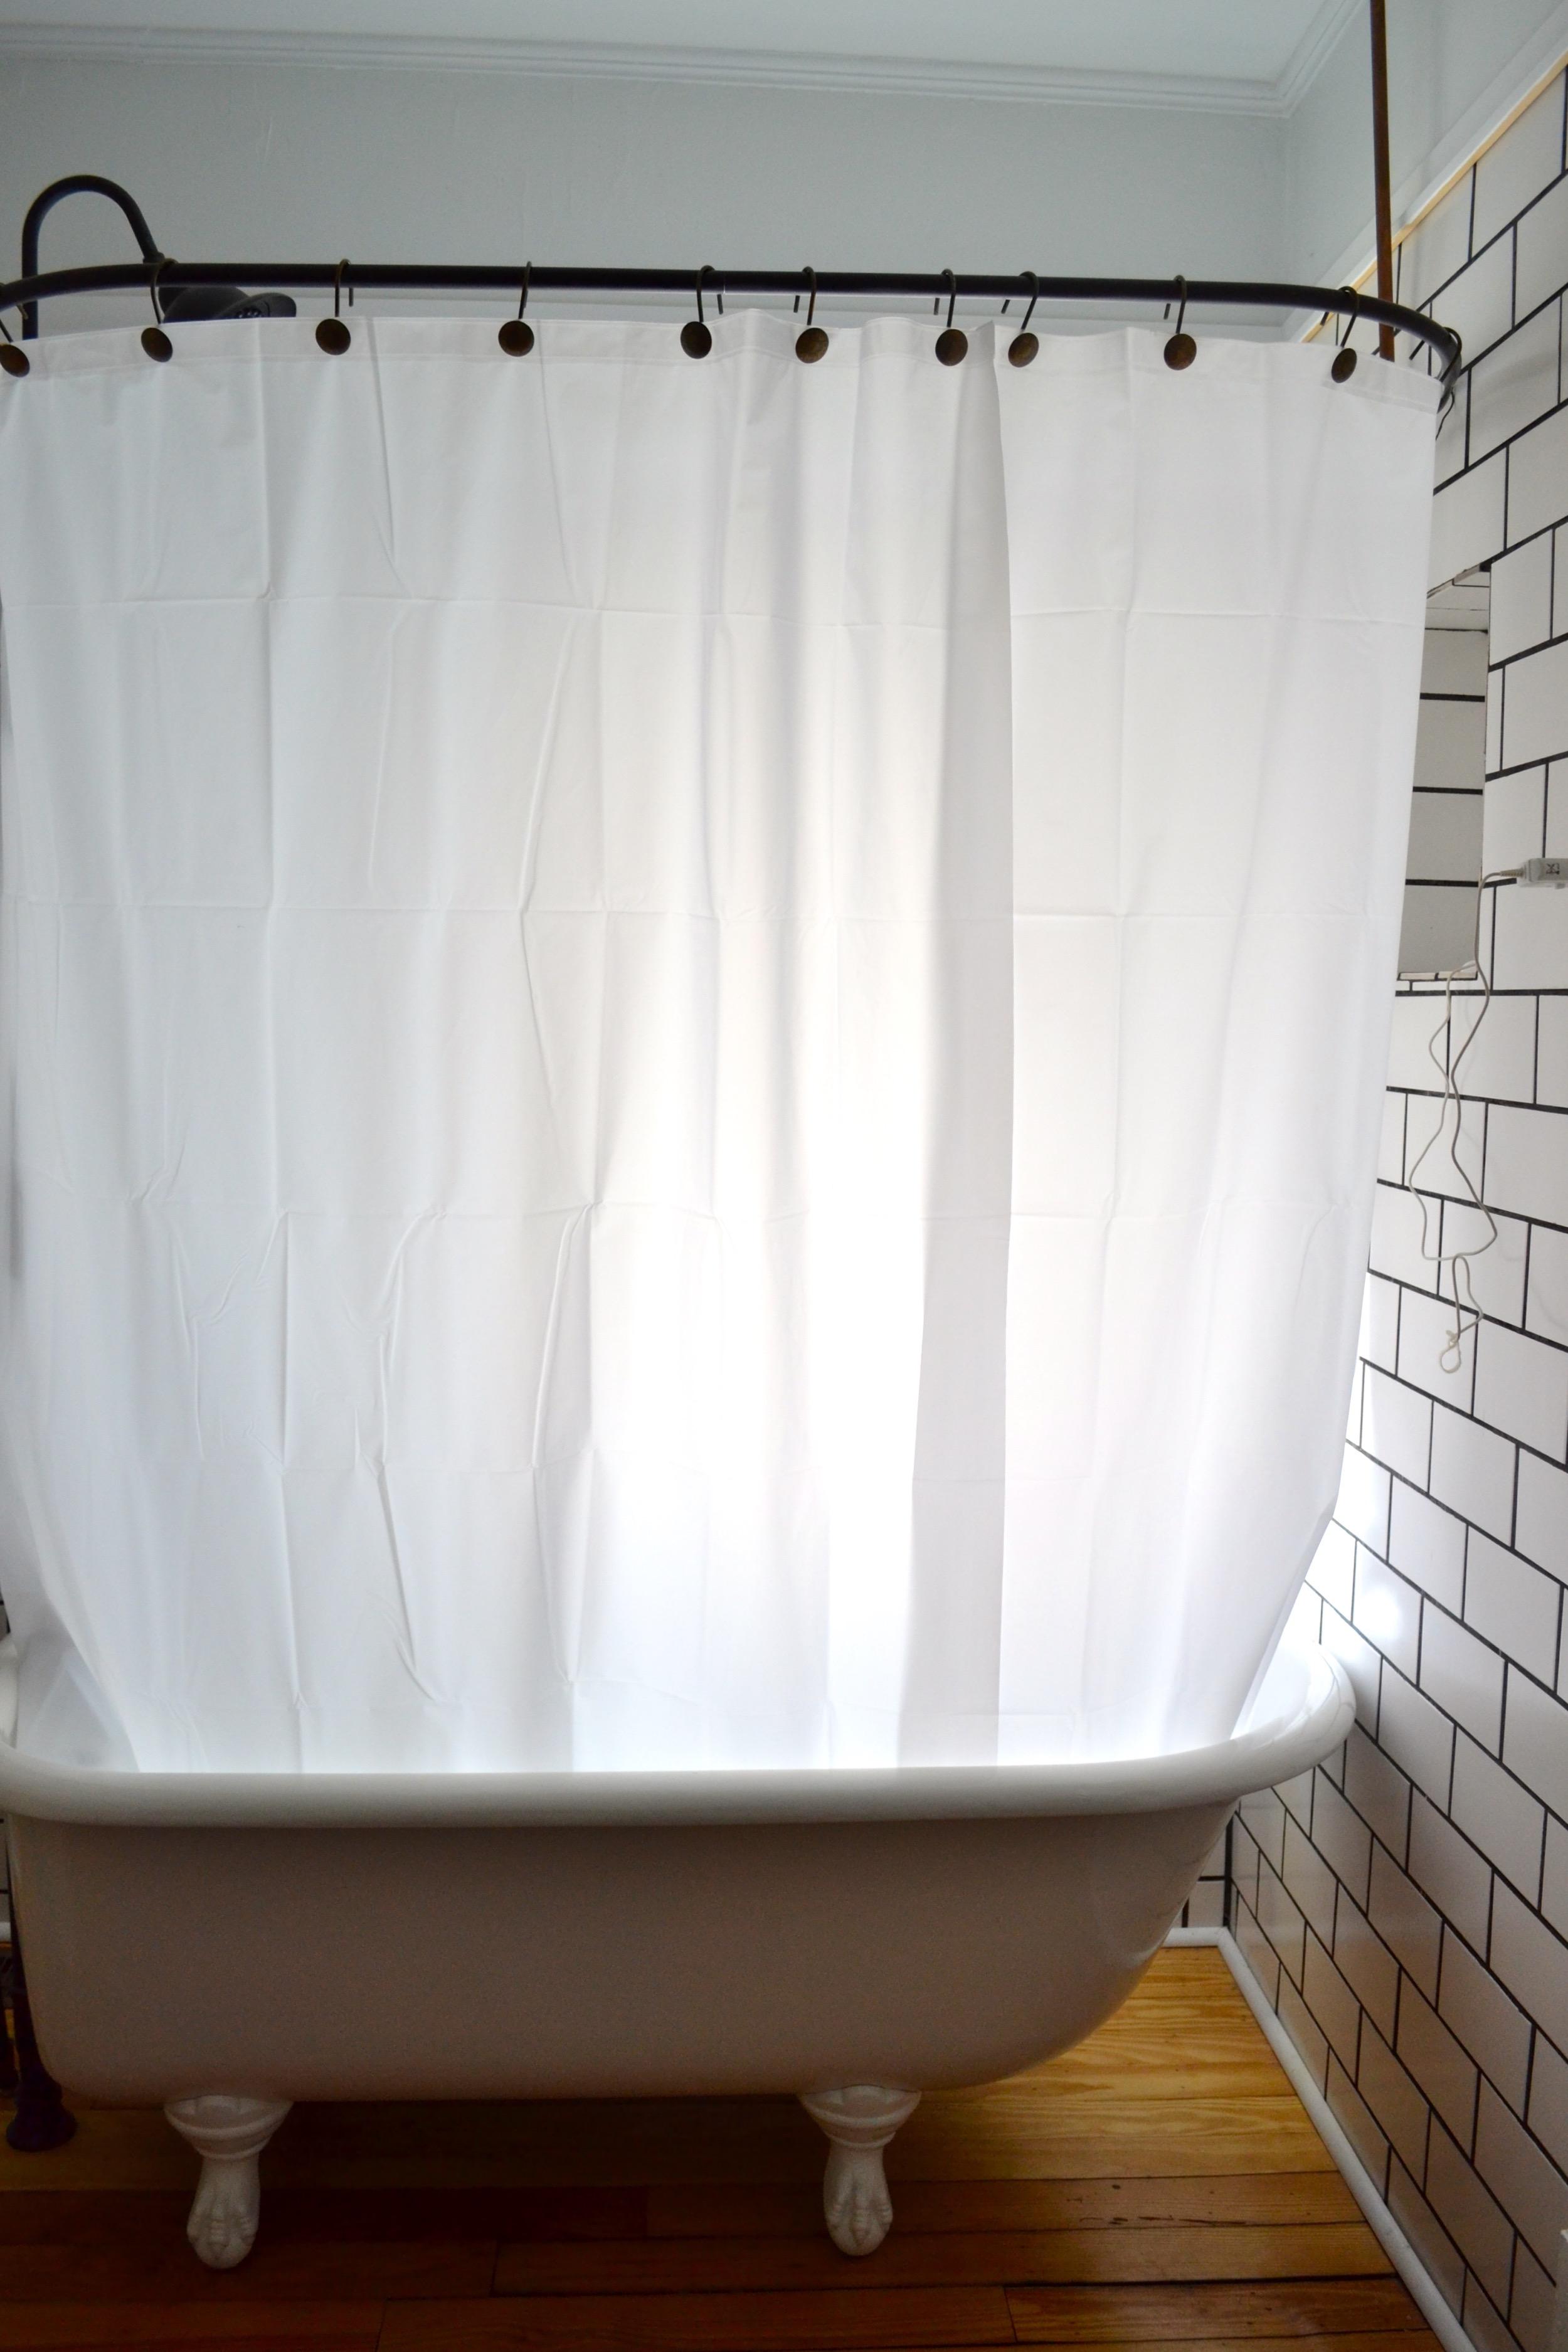 clawfoot tub shower sticking problem